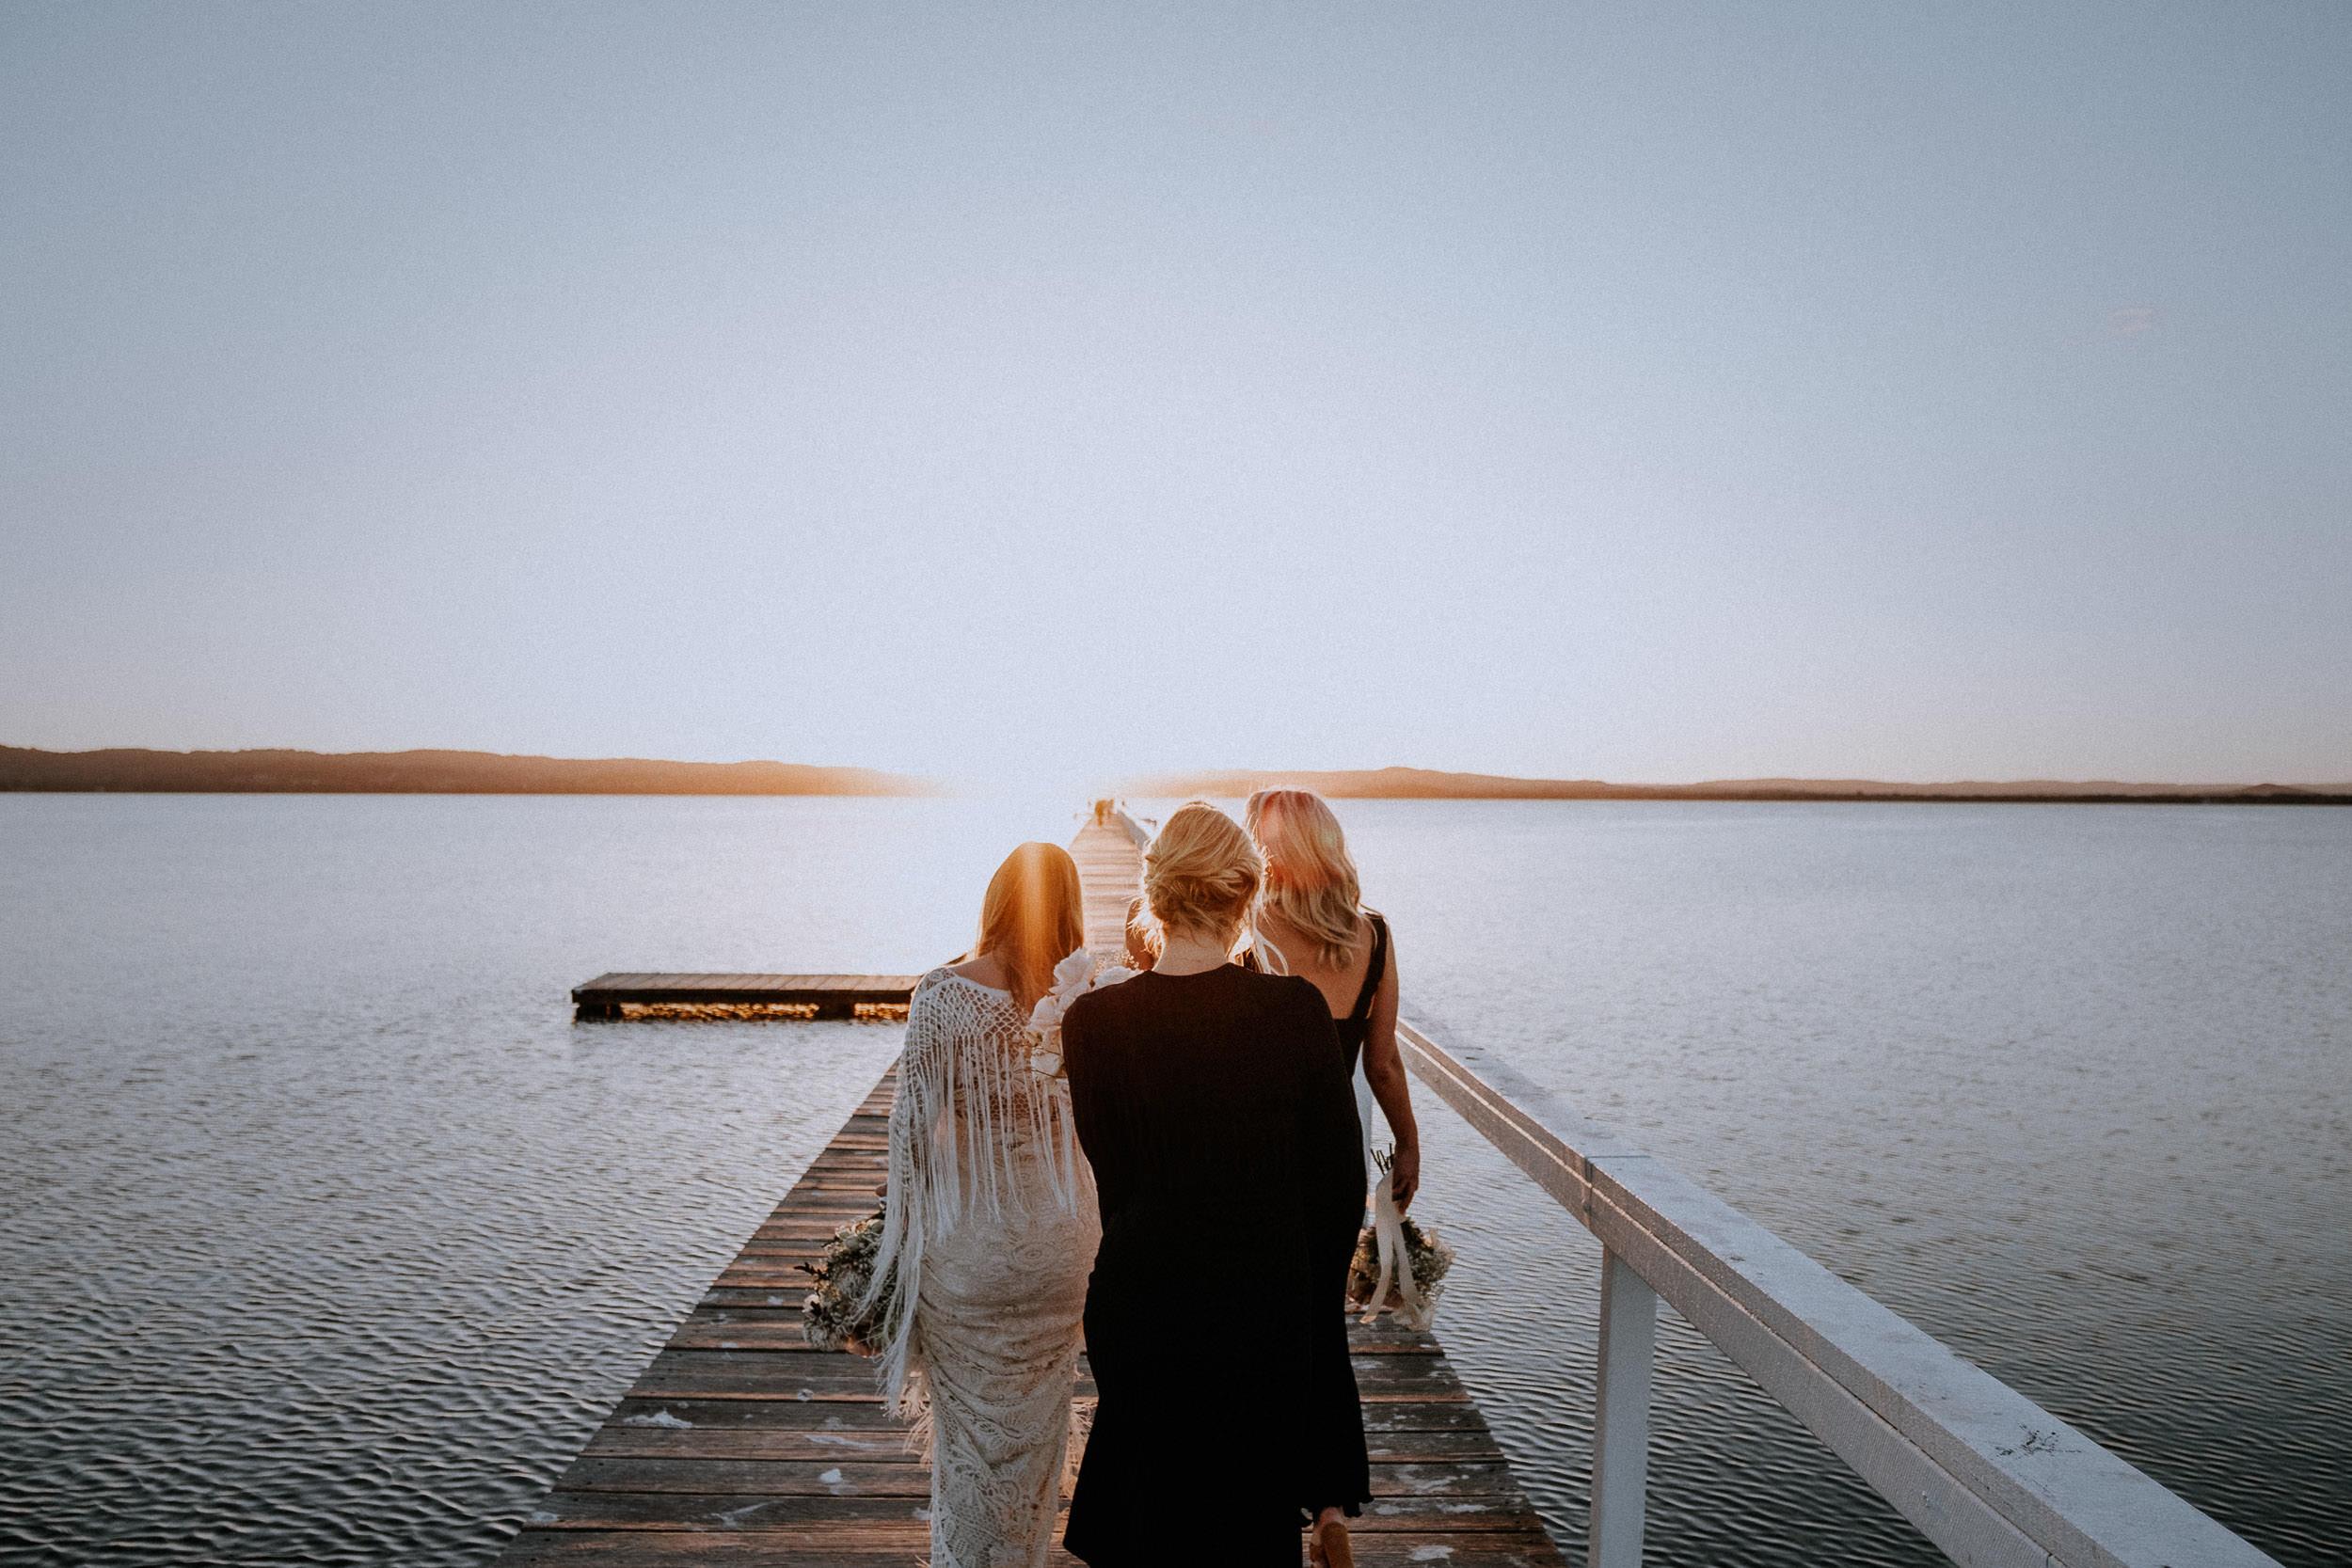 S&A Elopement - Kings & Thieves - Shred 'Til Dead - Central Coast Beach Forest Wedding - 369.jpg